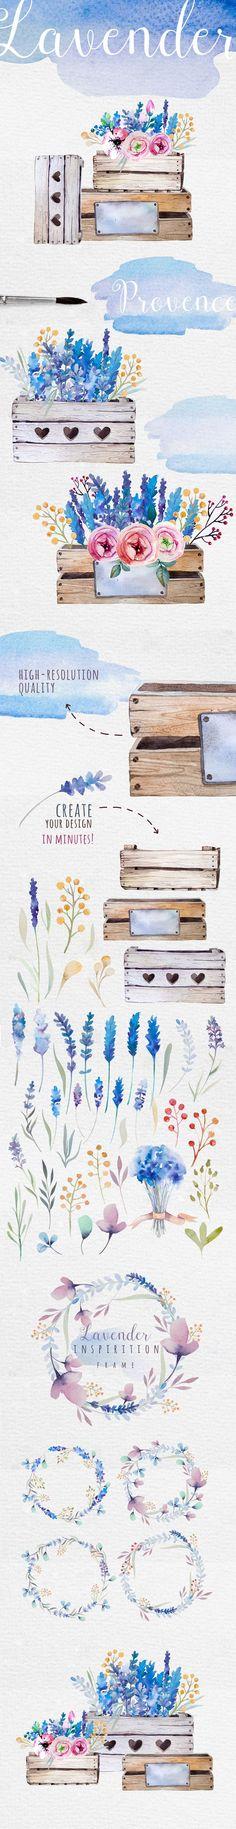 Lavender watercolor DIY by Peace ART on Creative Market #watercolor #design #lavender